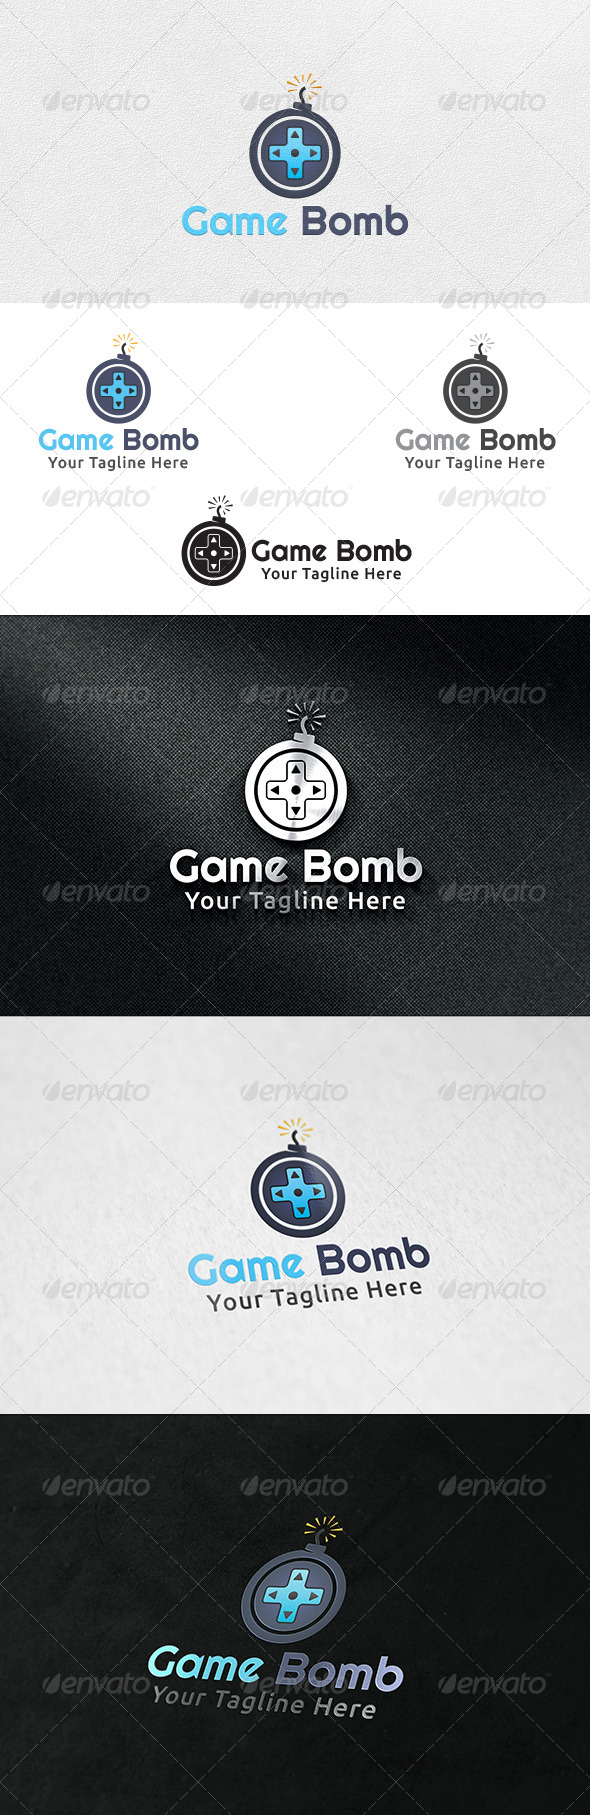 Game Bomb - Logo Template - Symbols Logo Templates